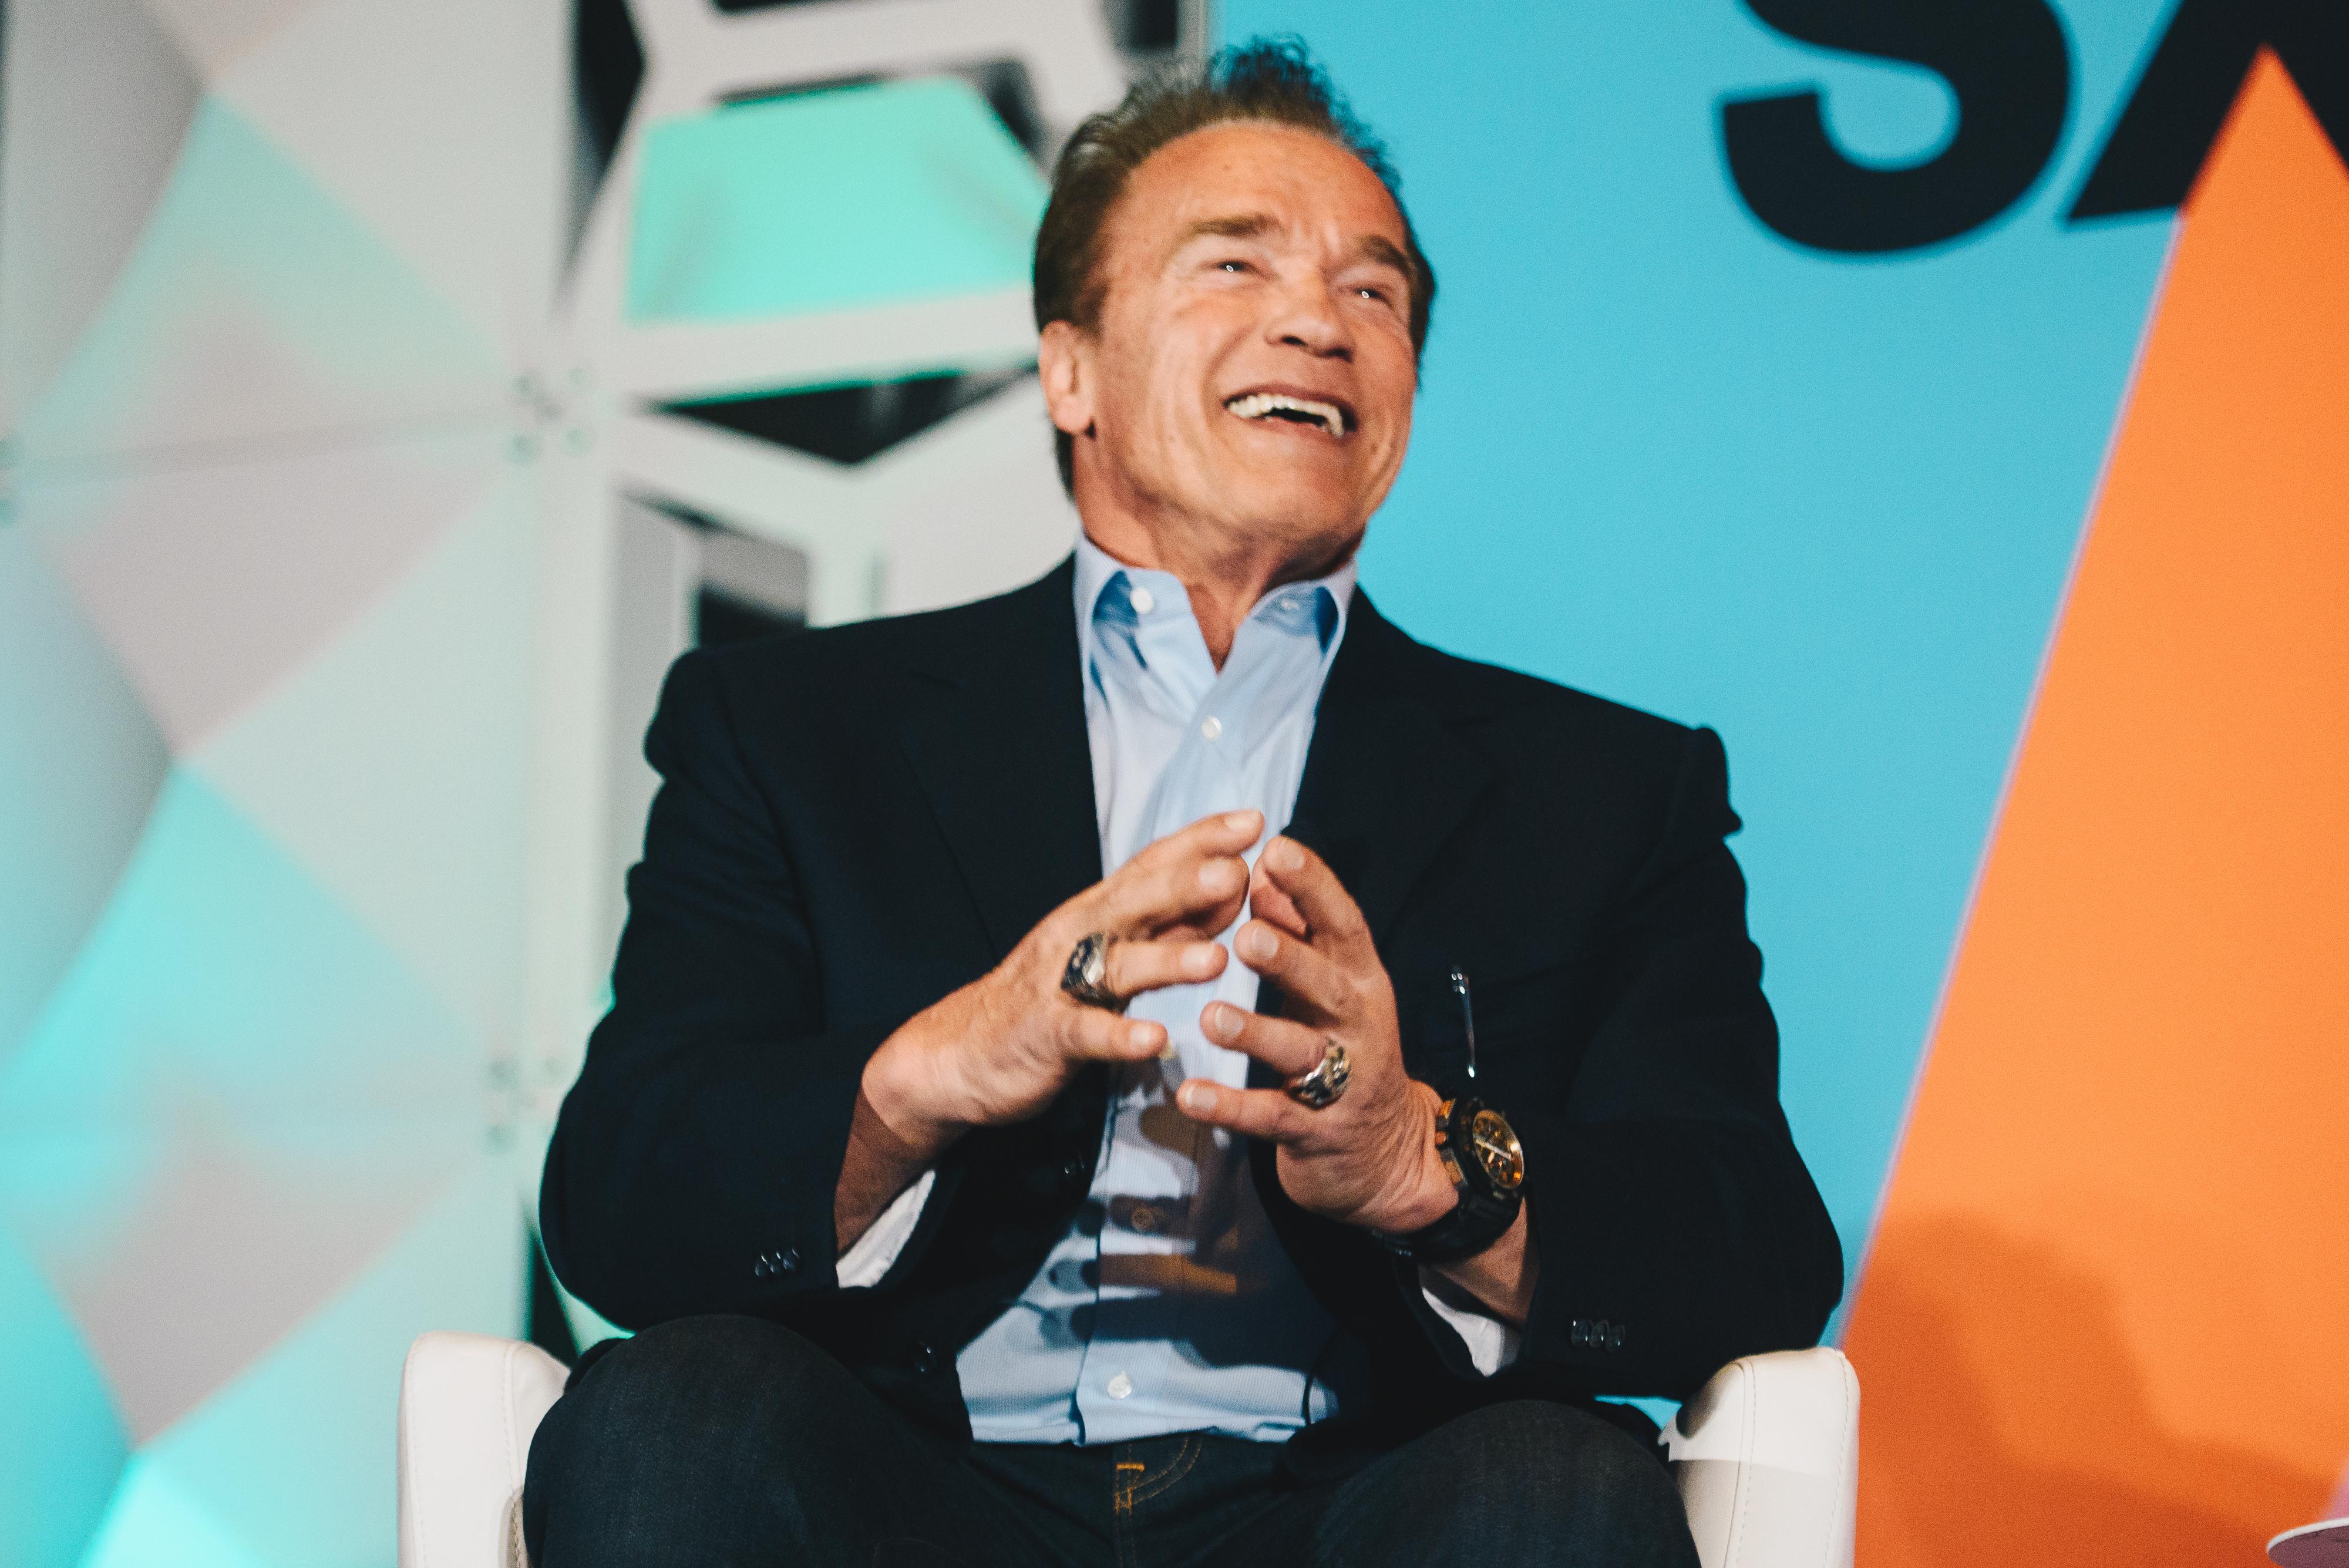 Arnold Schwarzenegger | Photo by Judy Won